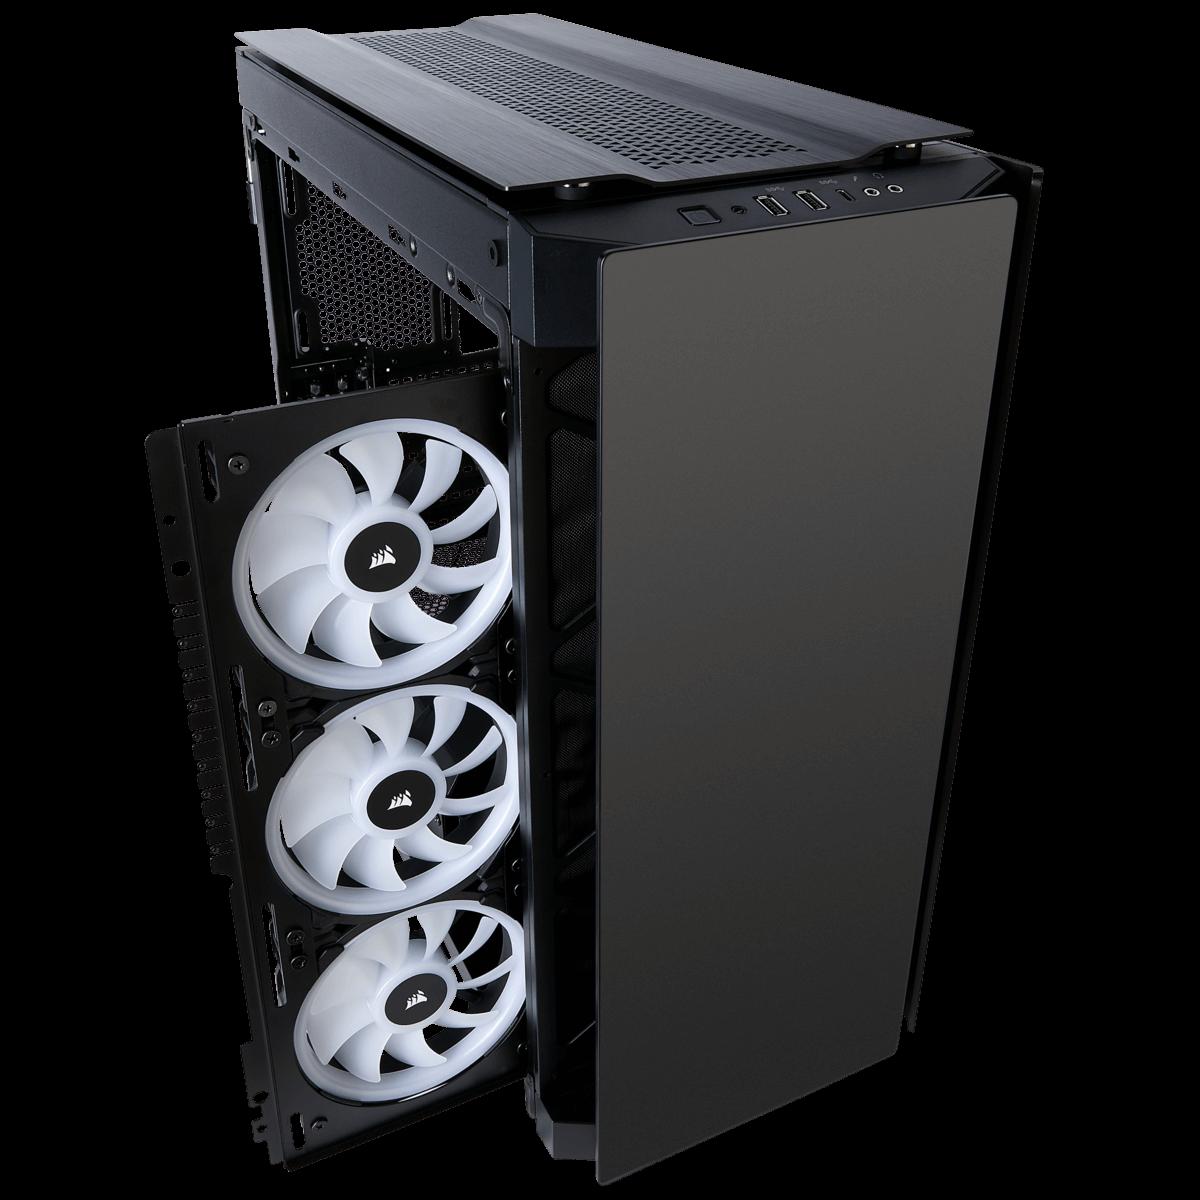 Gabinete Gamer Corsair Obsidian 500D RGB SE Premium, MidTower, Com 3 Fan, Vidro Temperado, Sem Fonte, CC-9011139-WW